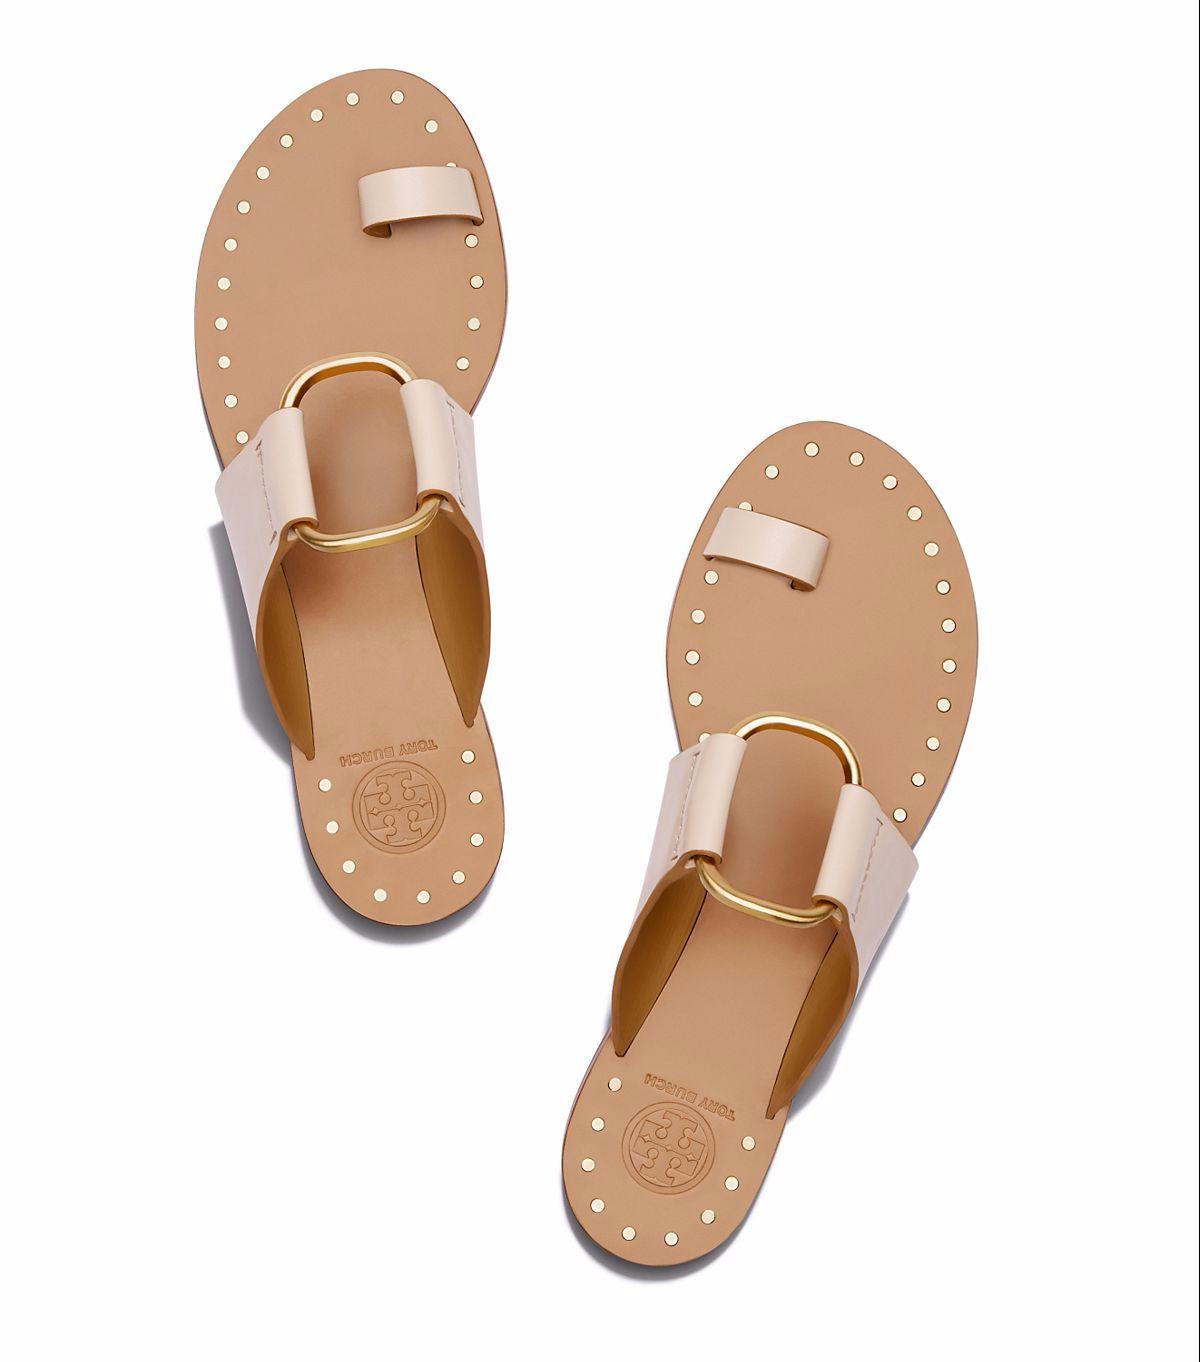 Tory Burch 'Brannan' Studded Sandal $295